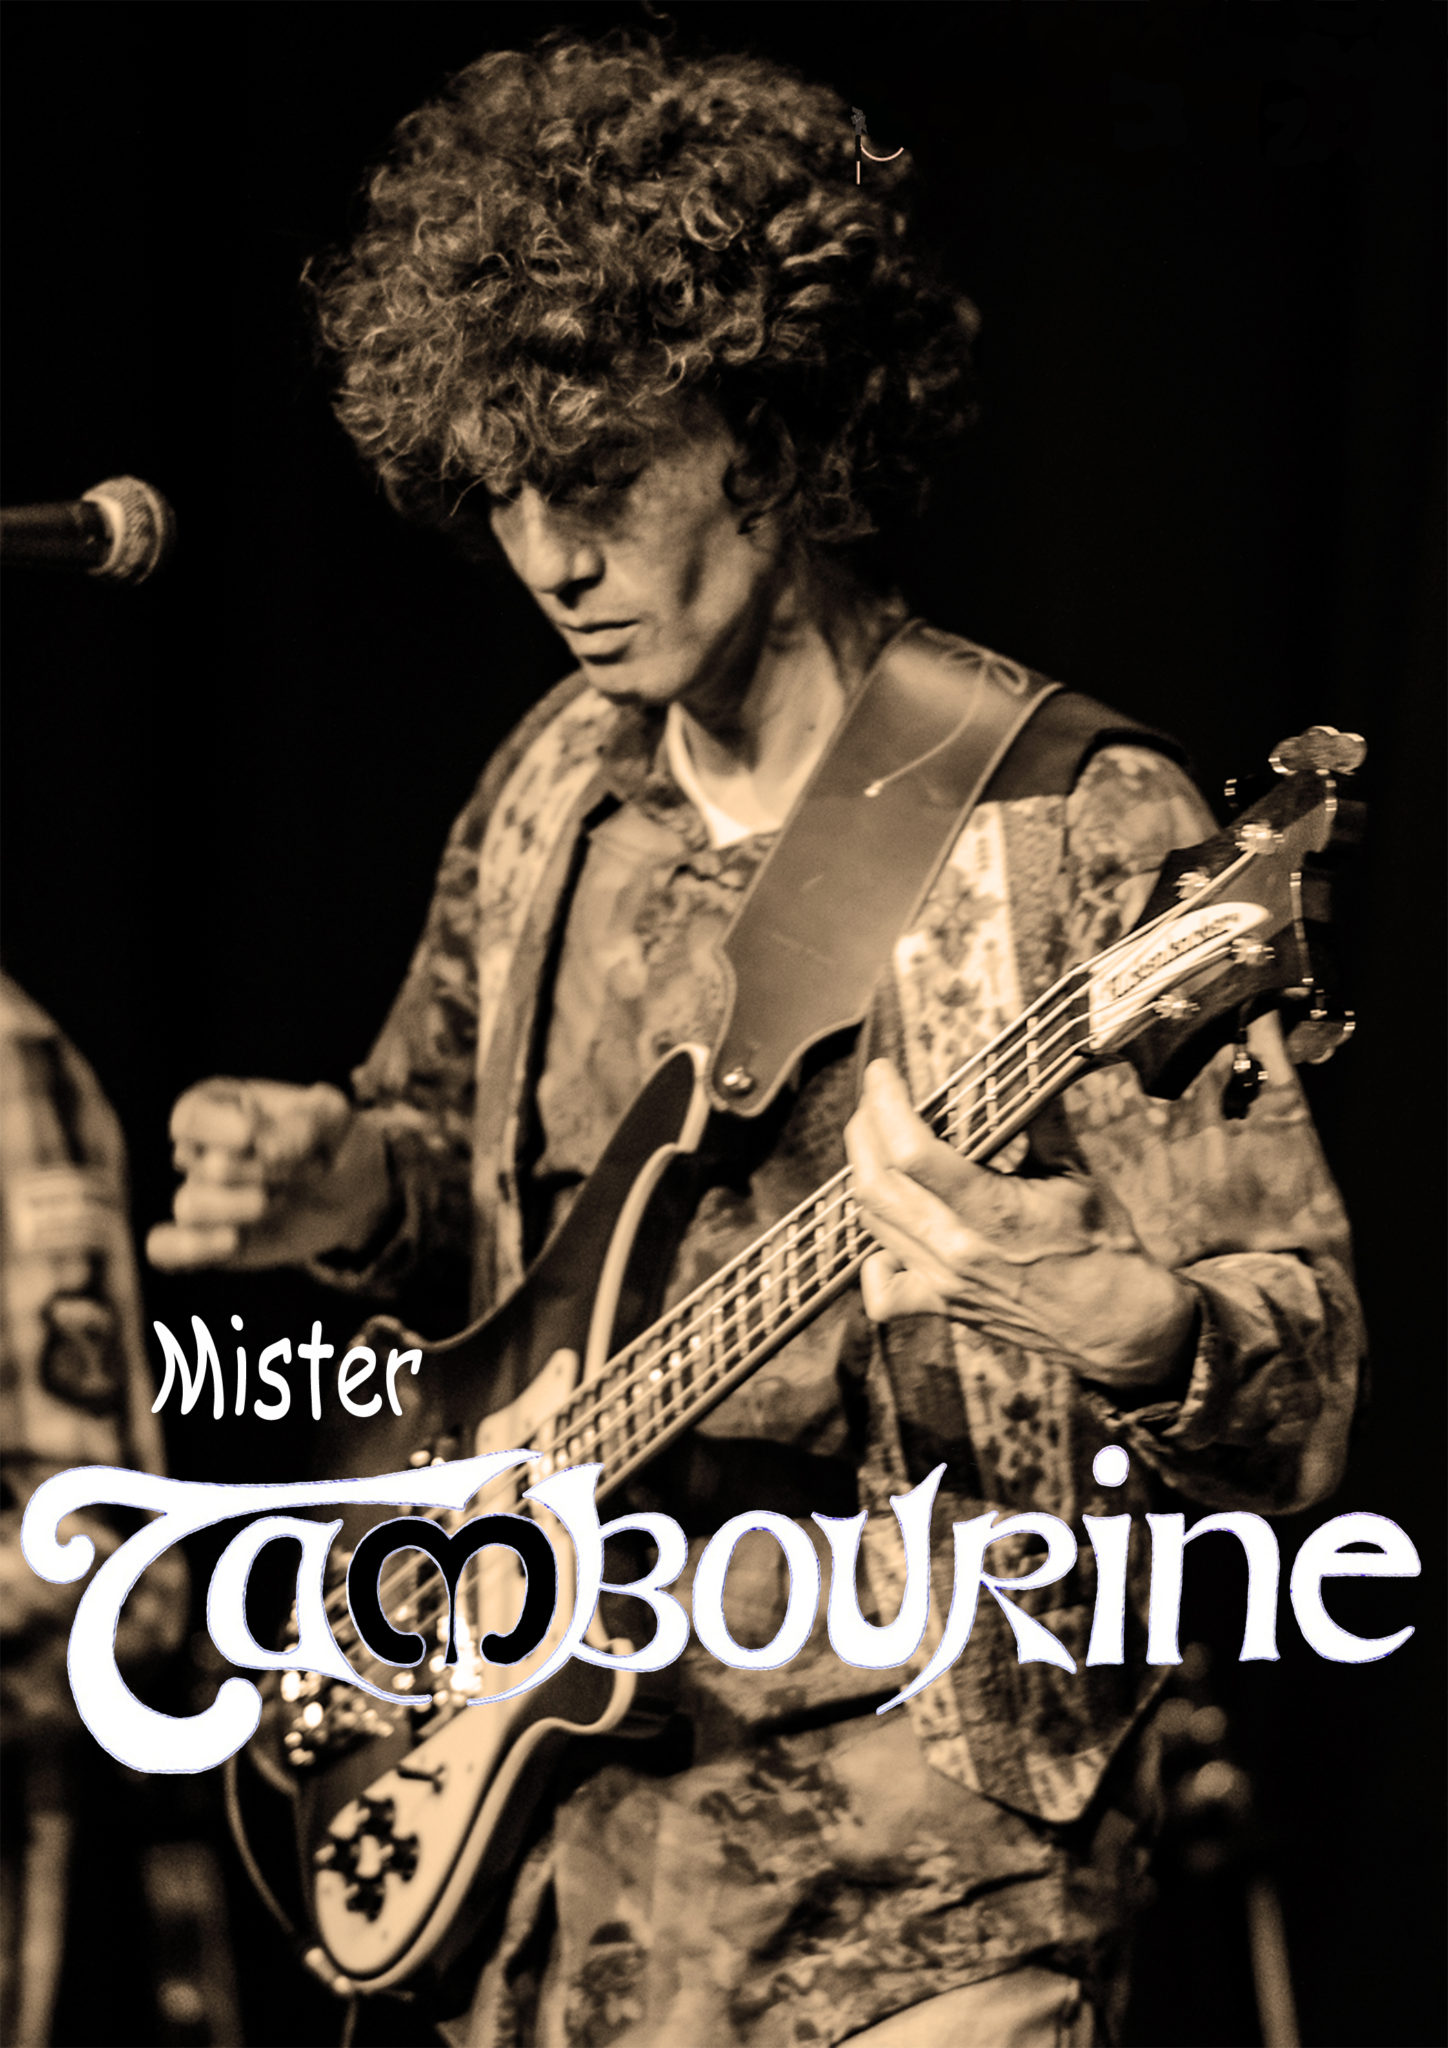 mister tambourine